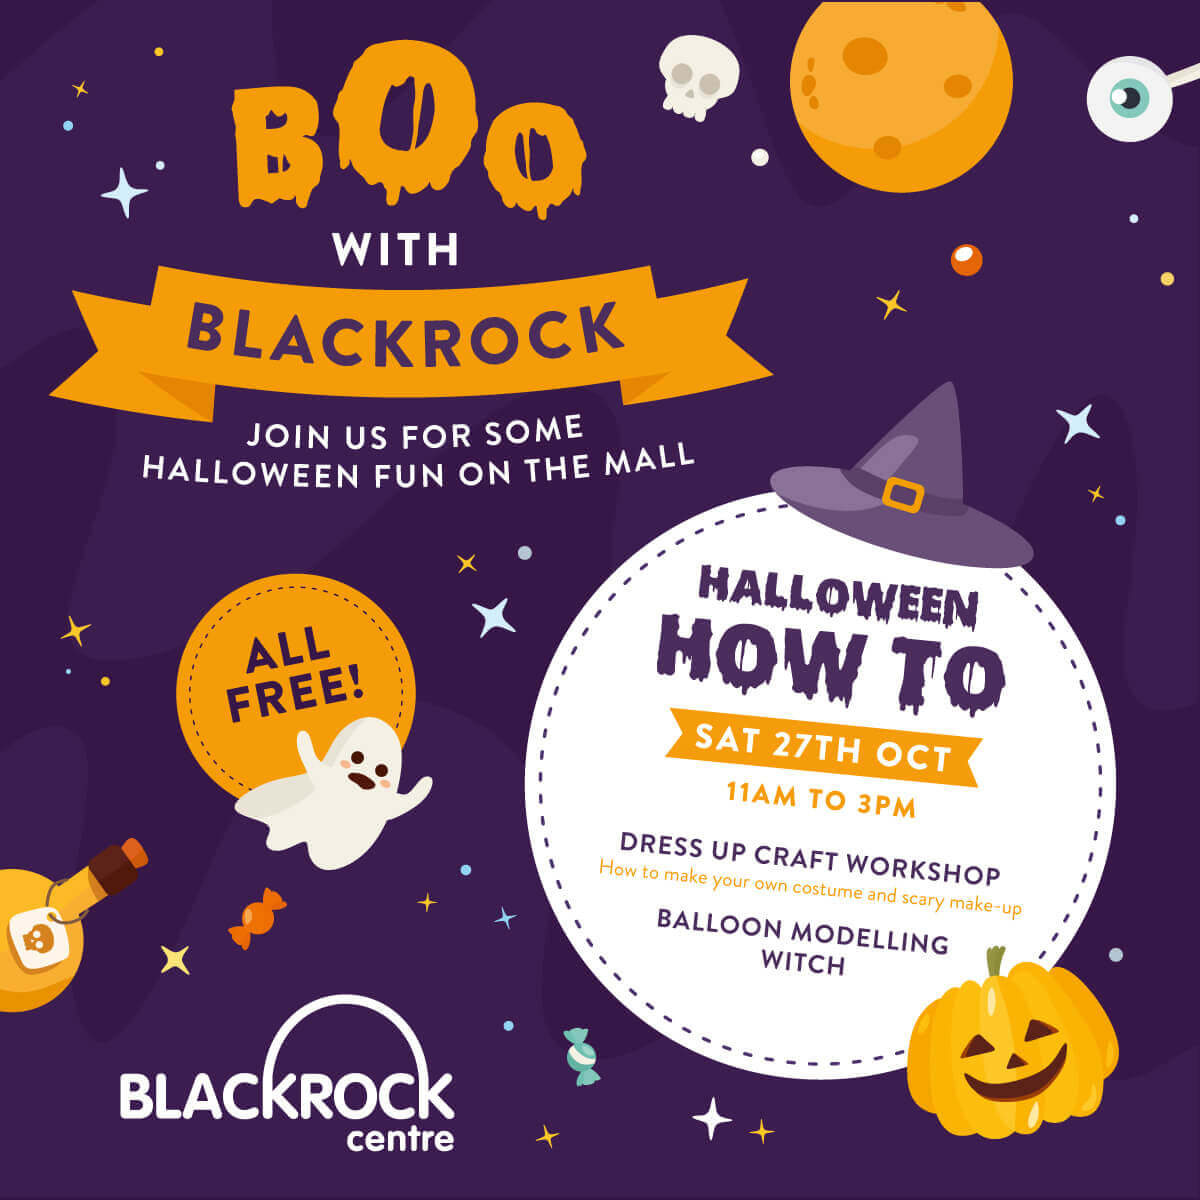 Blackrock, Ireland Food & Drink Events | Eventbrite